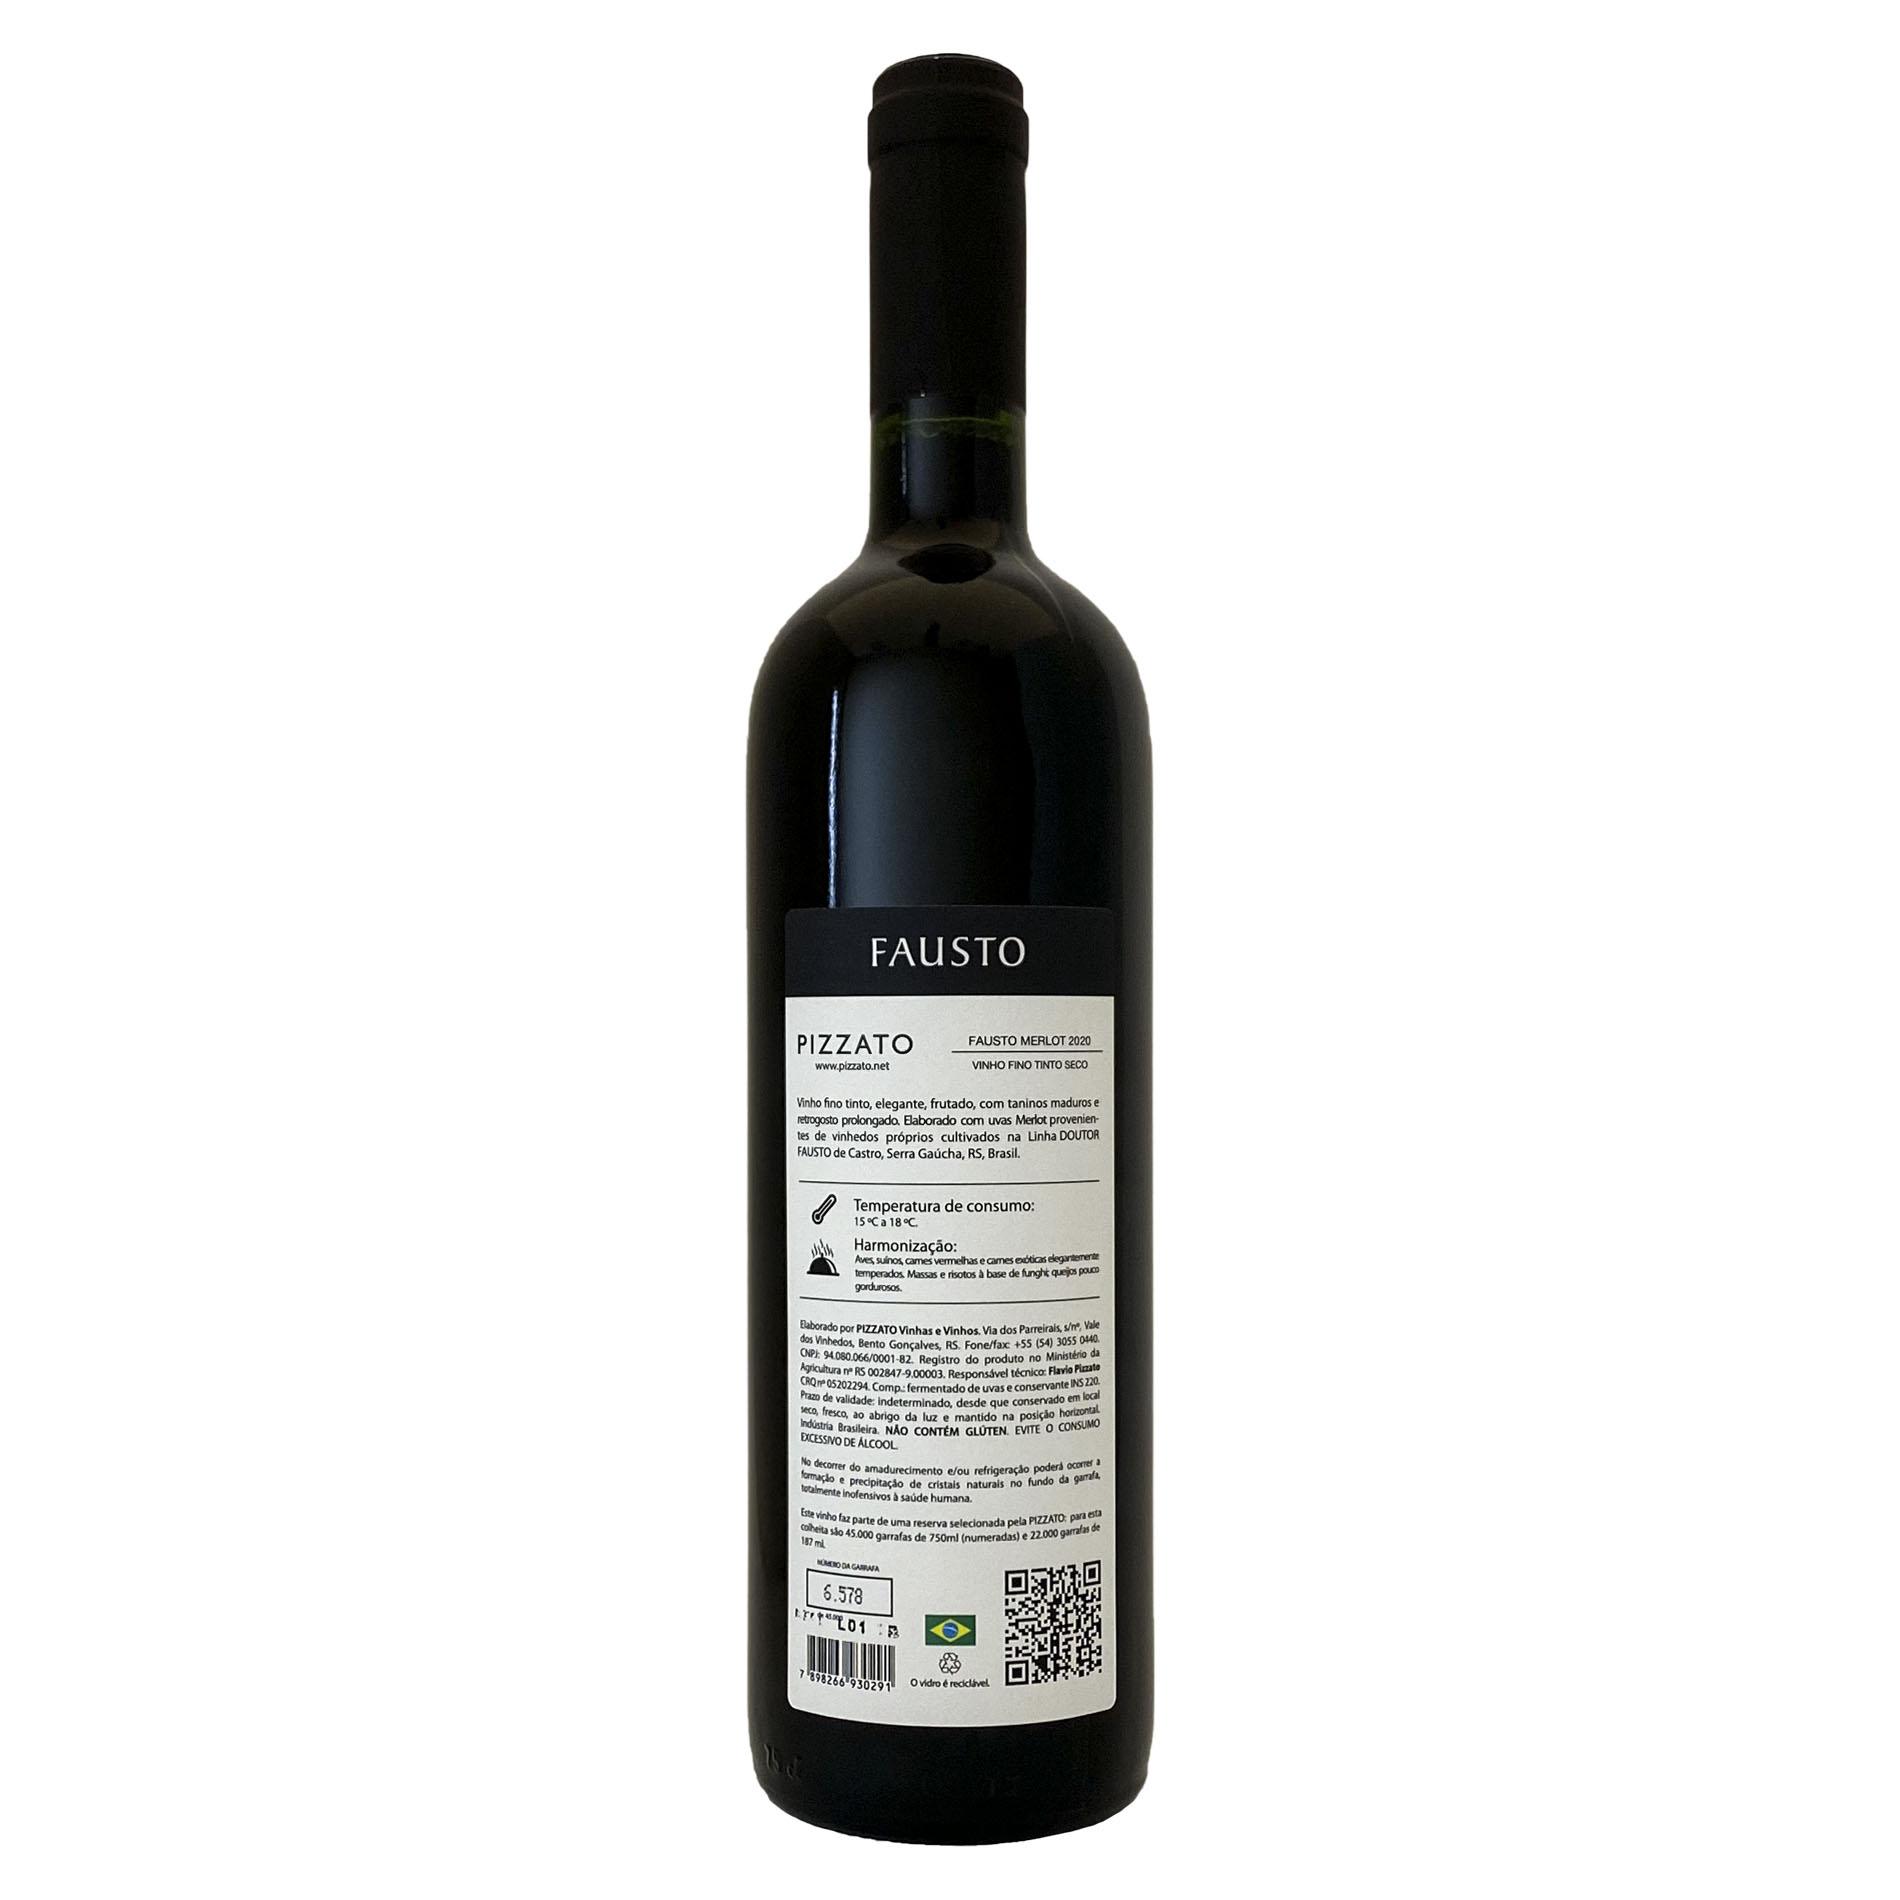 FAUSTO (de Pizzato) Merlot  - Vinerize